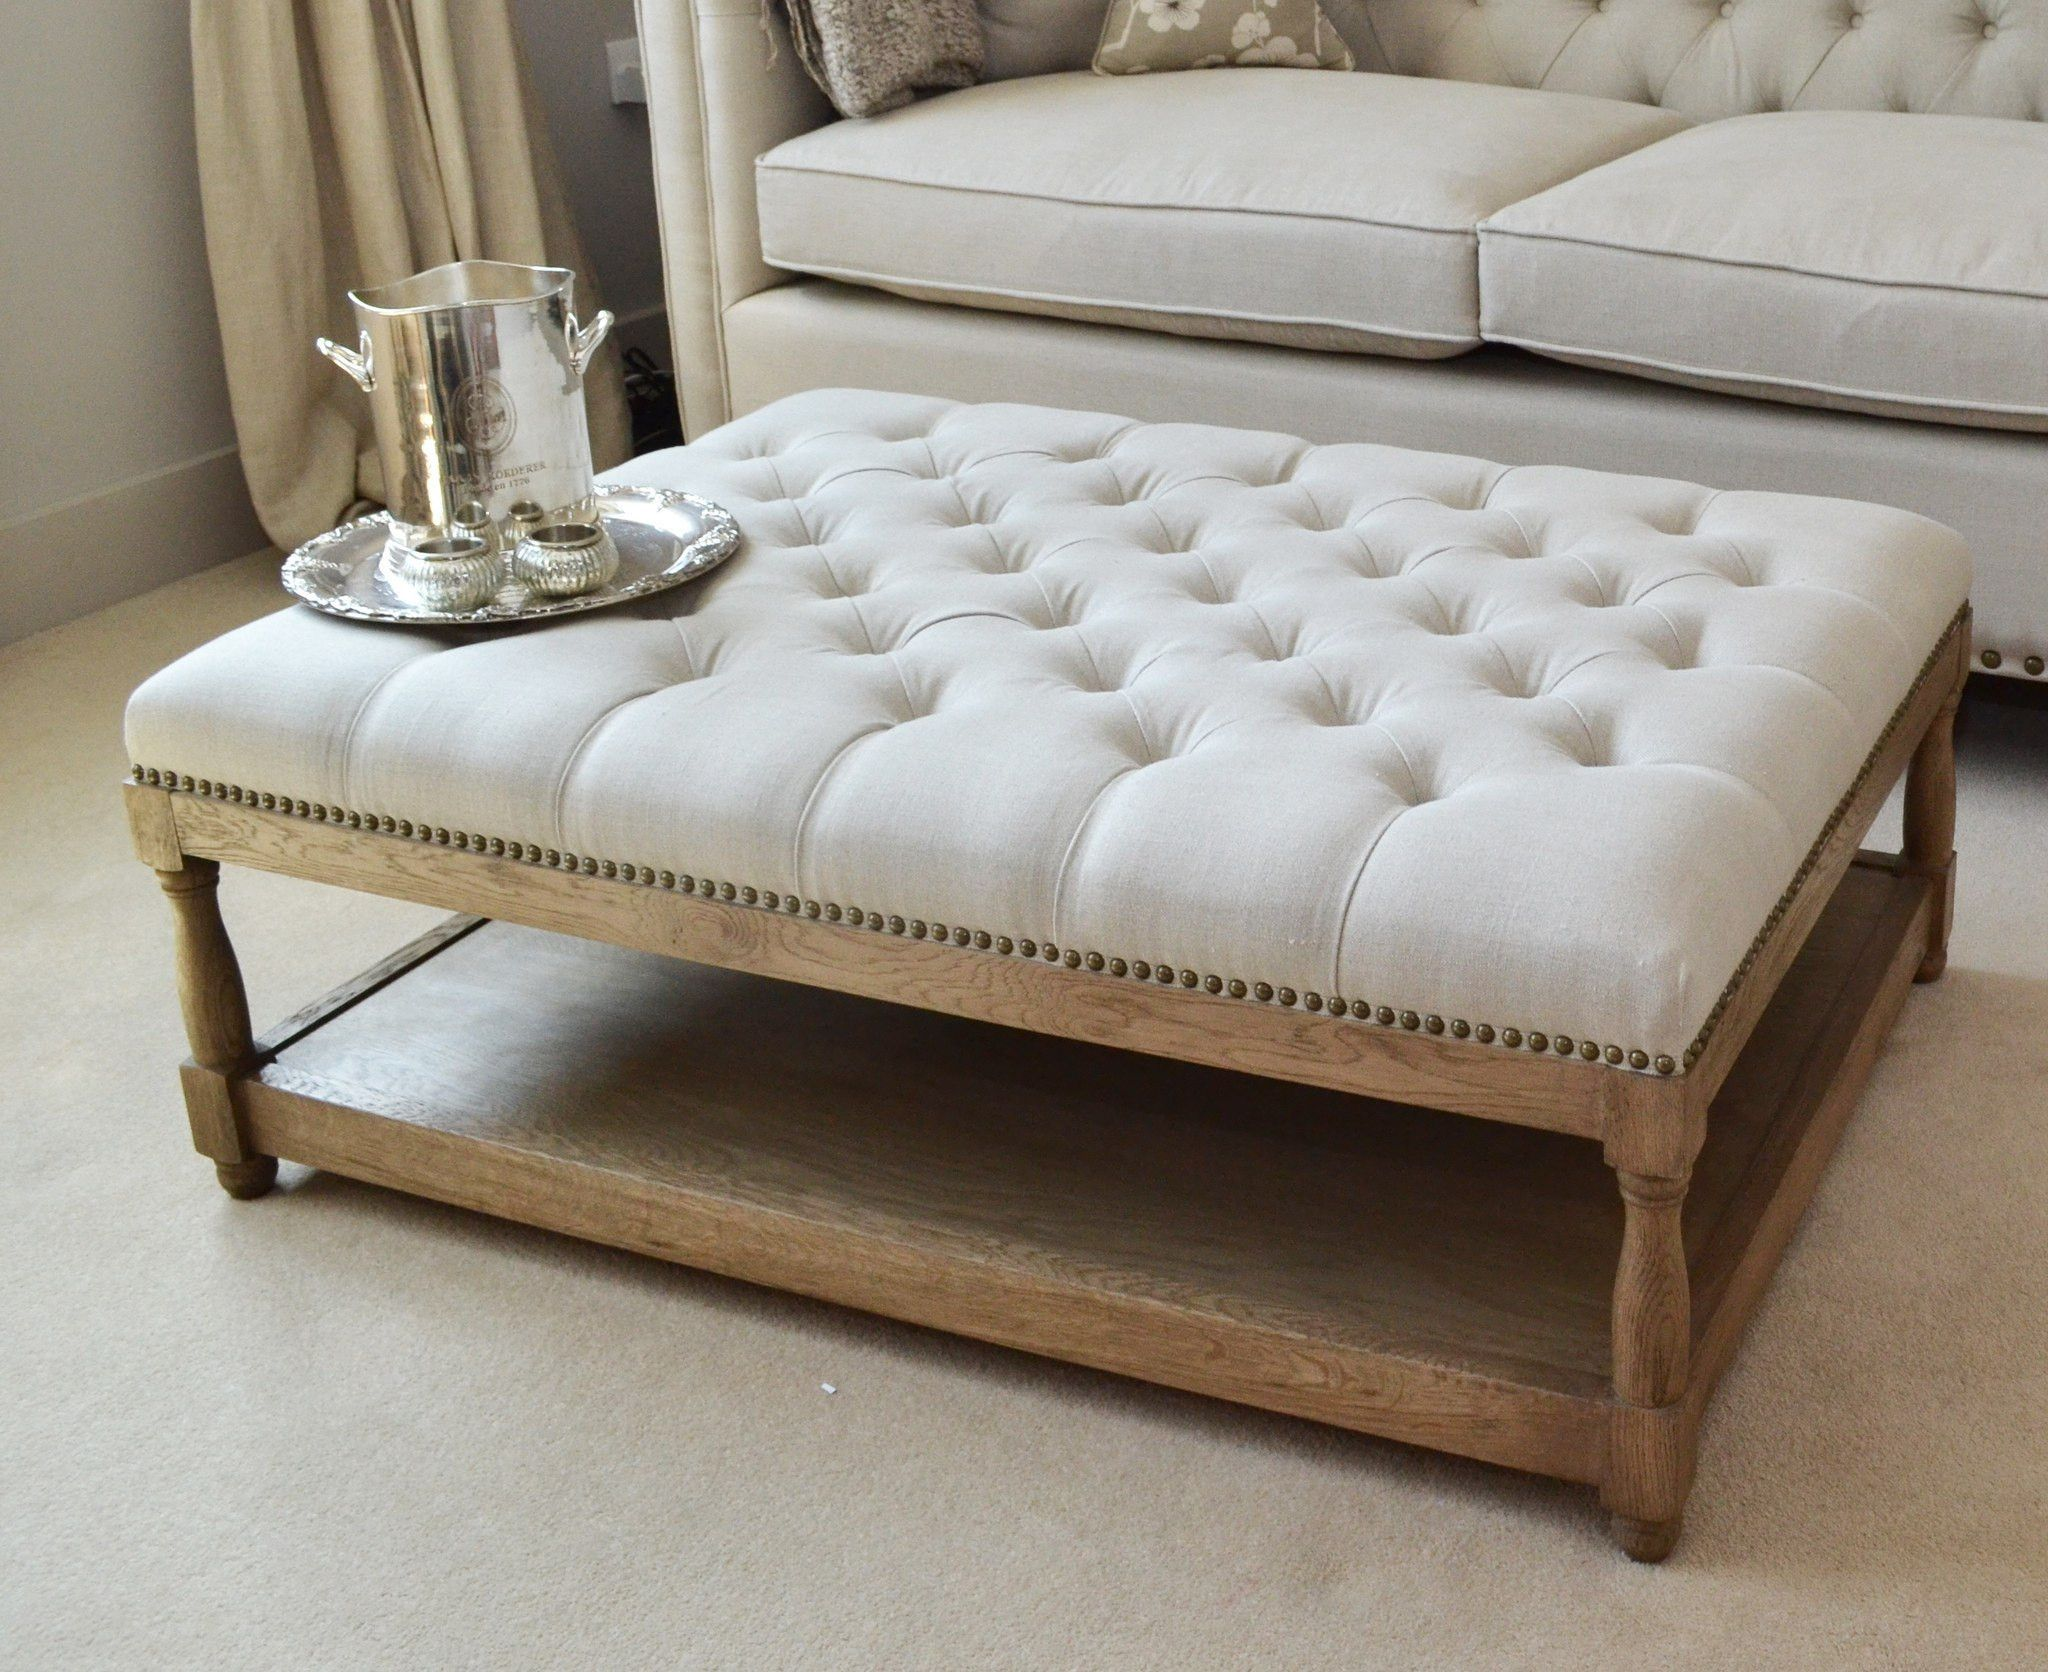 Renate Coffee Table Ottoman Ottoman Upholstered Petit Royale Ottoman Coffee Table Oatmeal